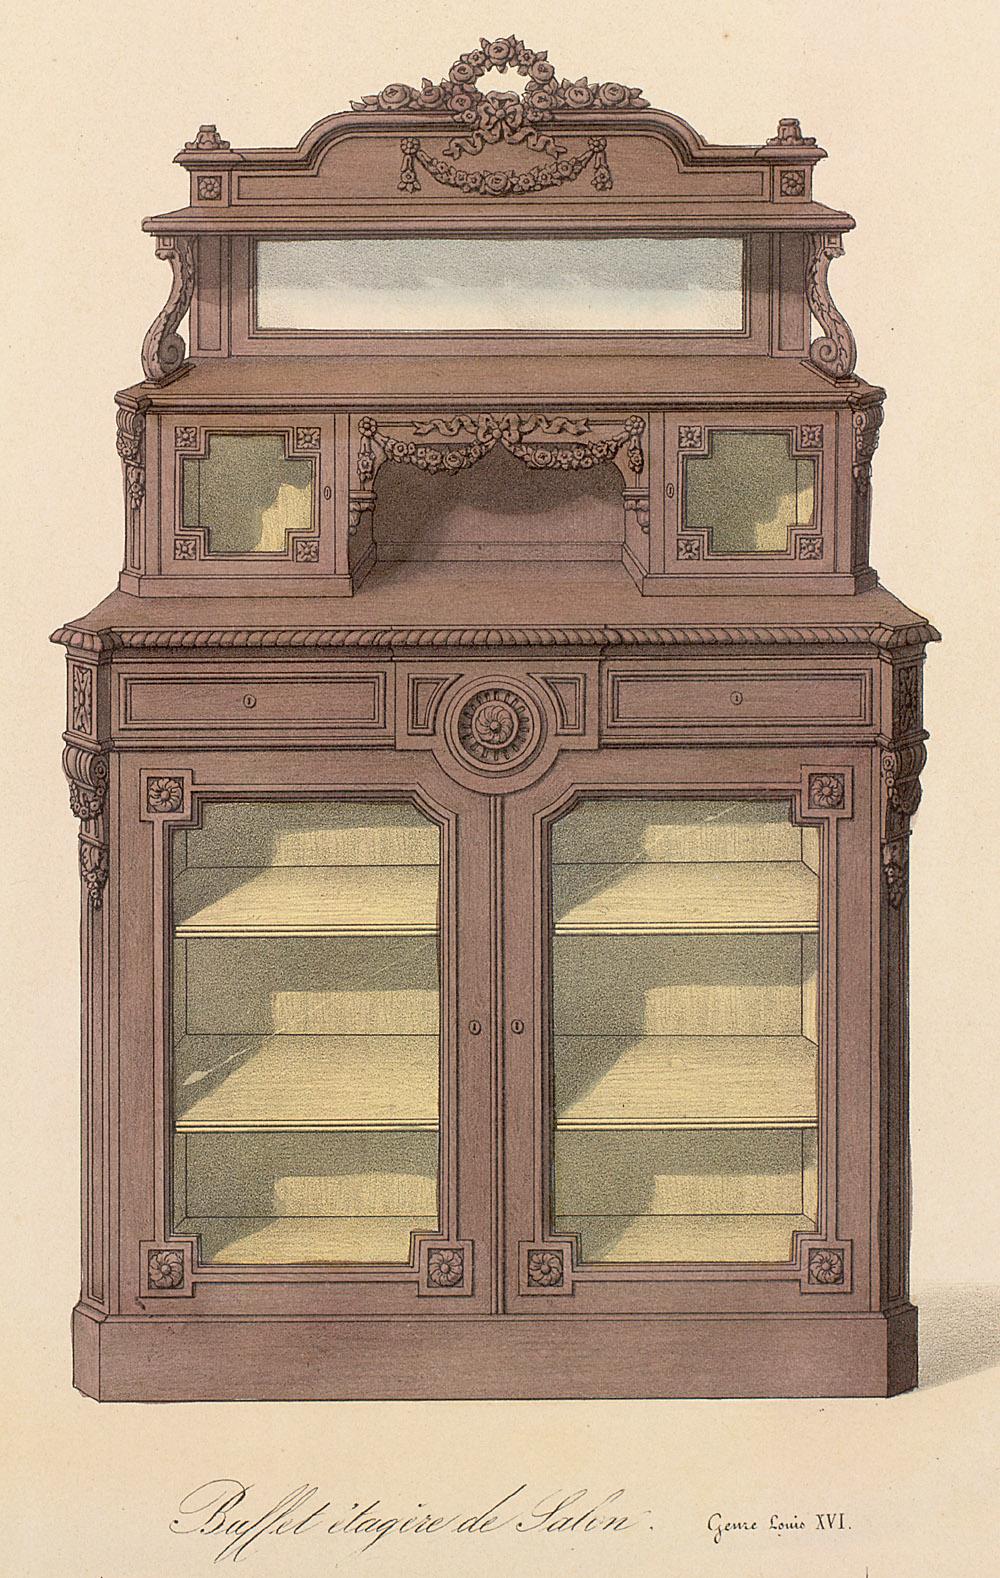 Cabinets (case furniture),  Image number:SIL12-2-310c